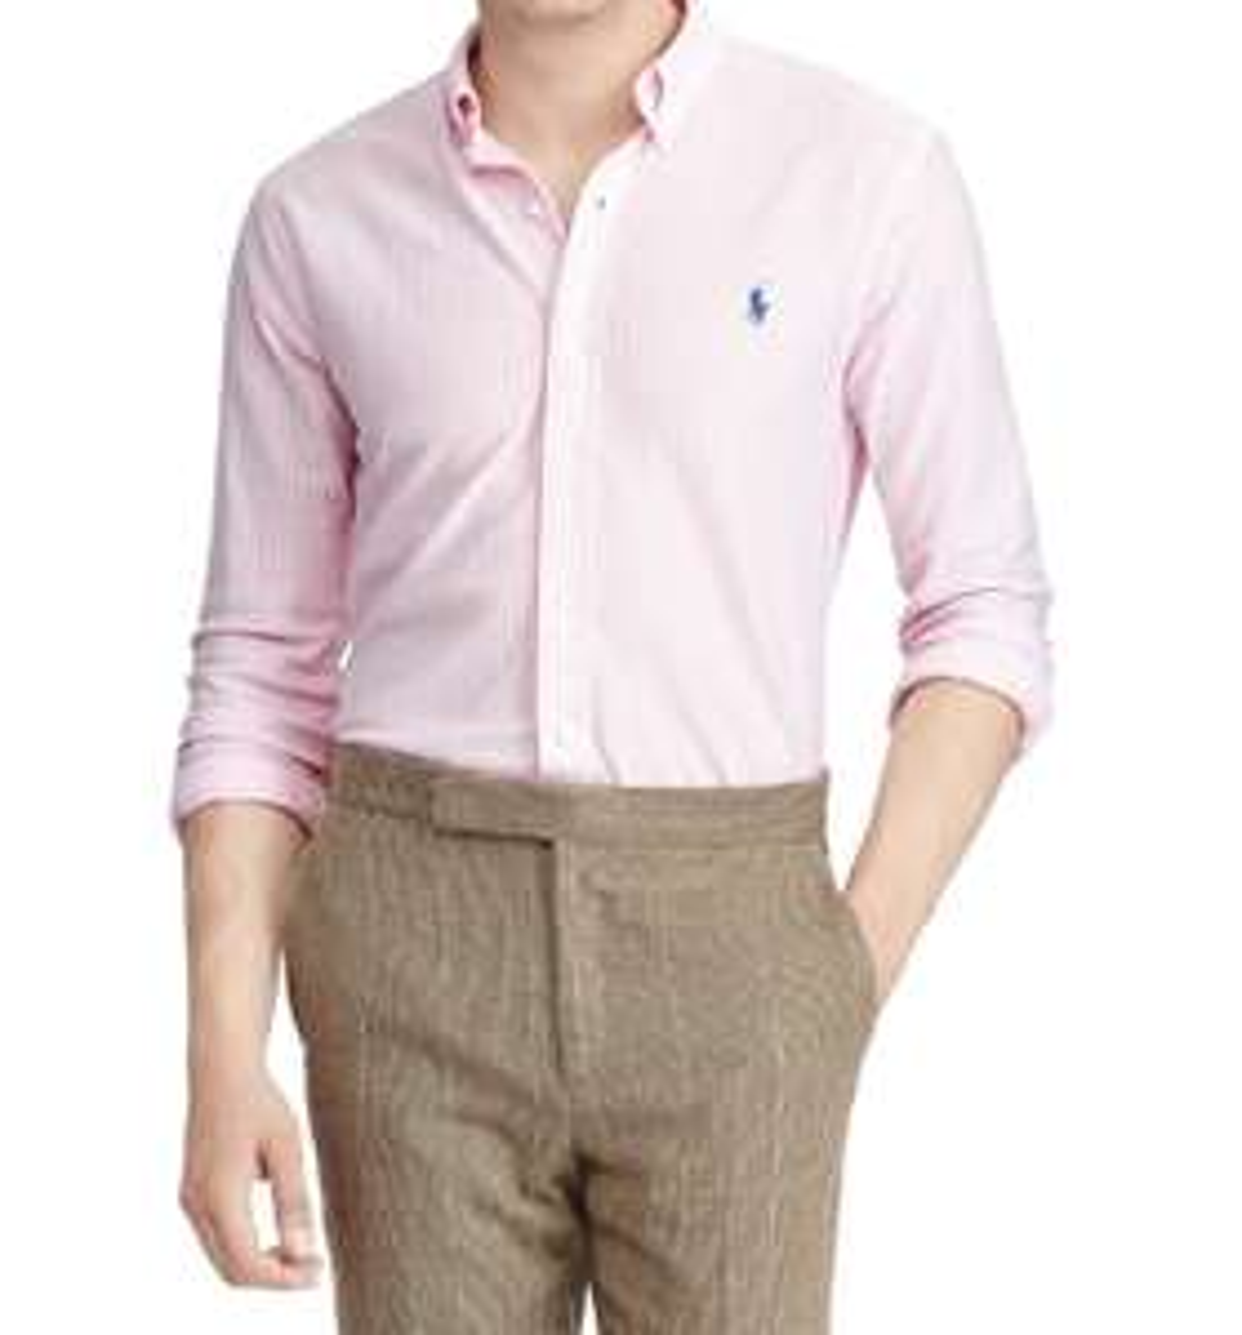 Chemise à rayures Ralph Lauren Slim Fit Polo - blanc/rose (tailles XL ou XXL)